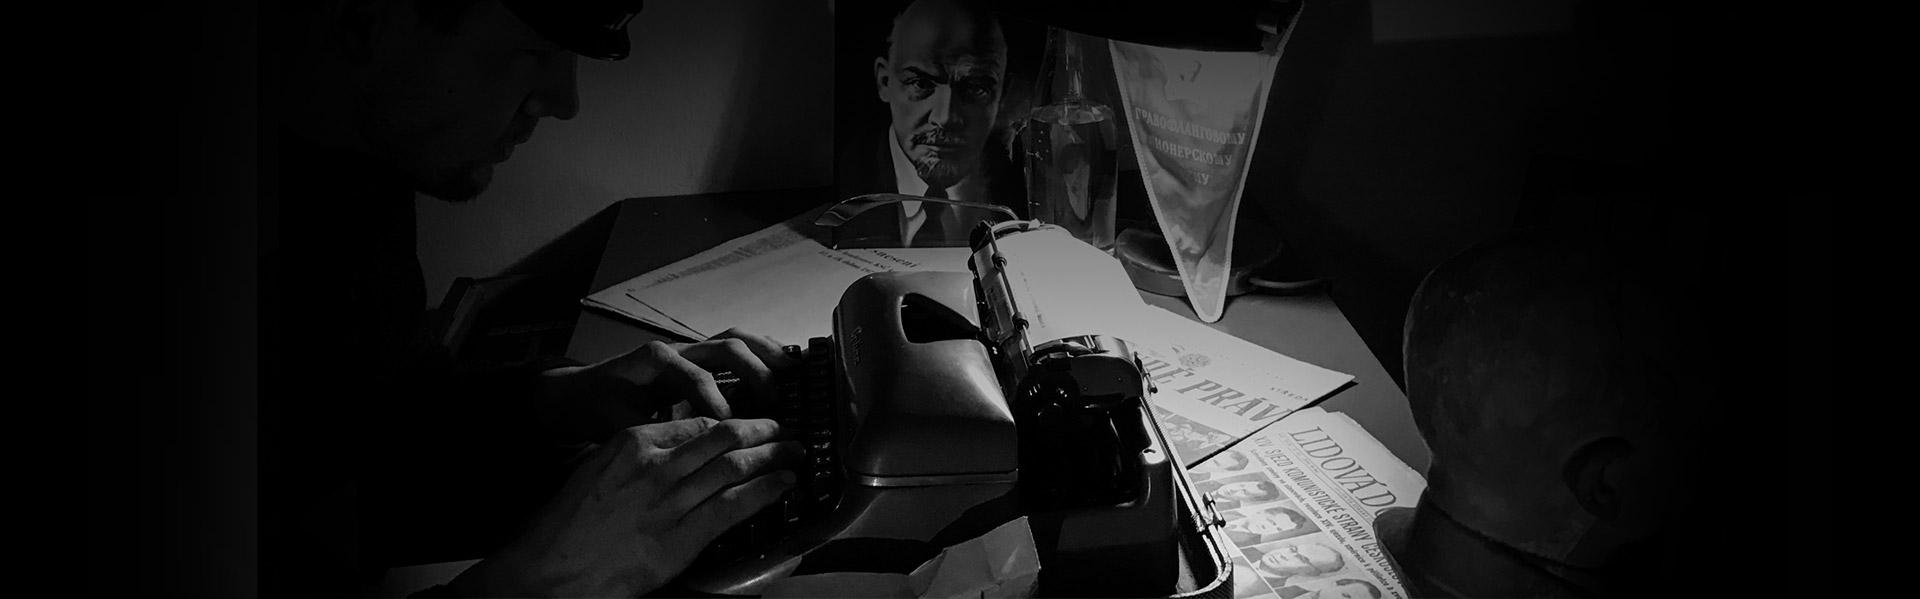 Disident - úniková hra Jihlava